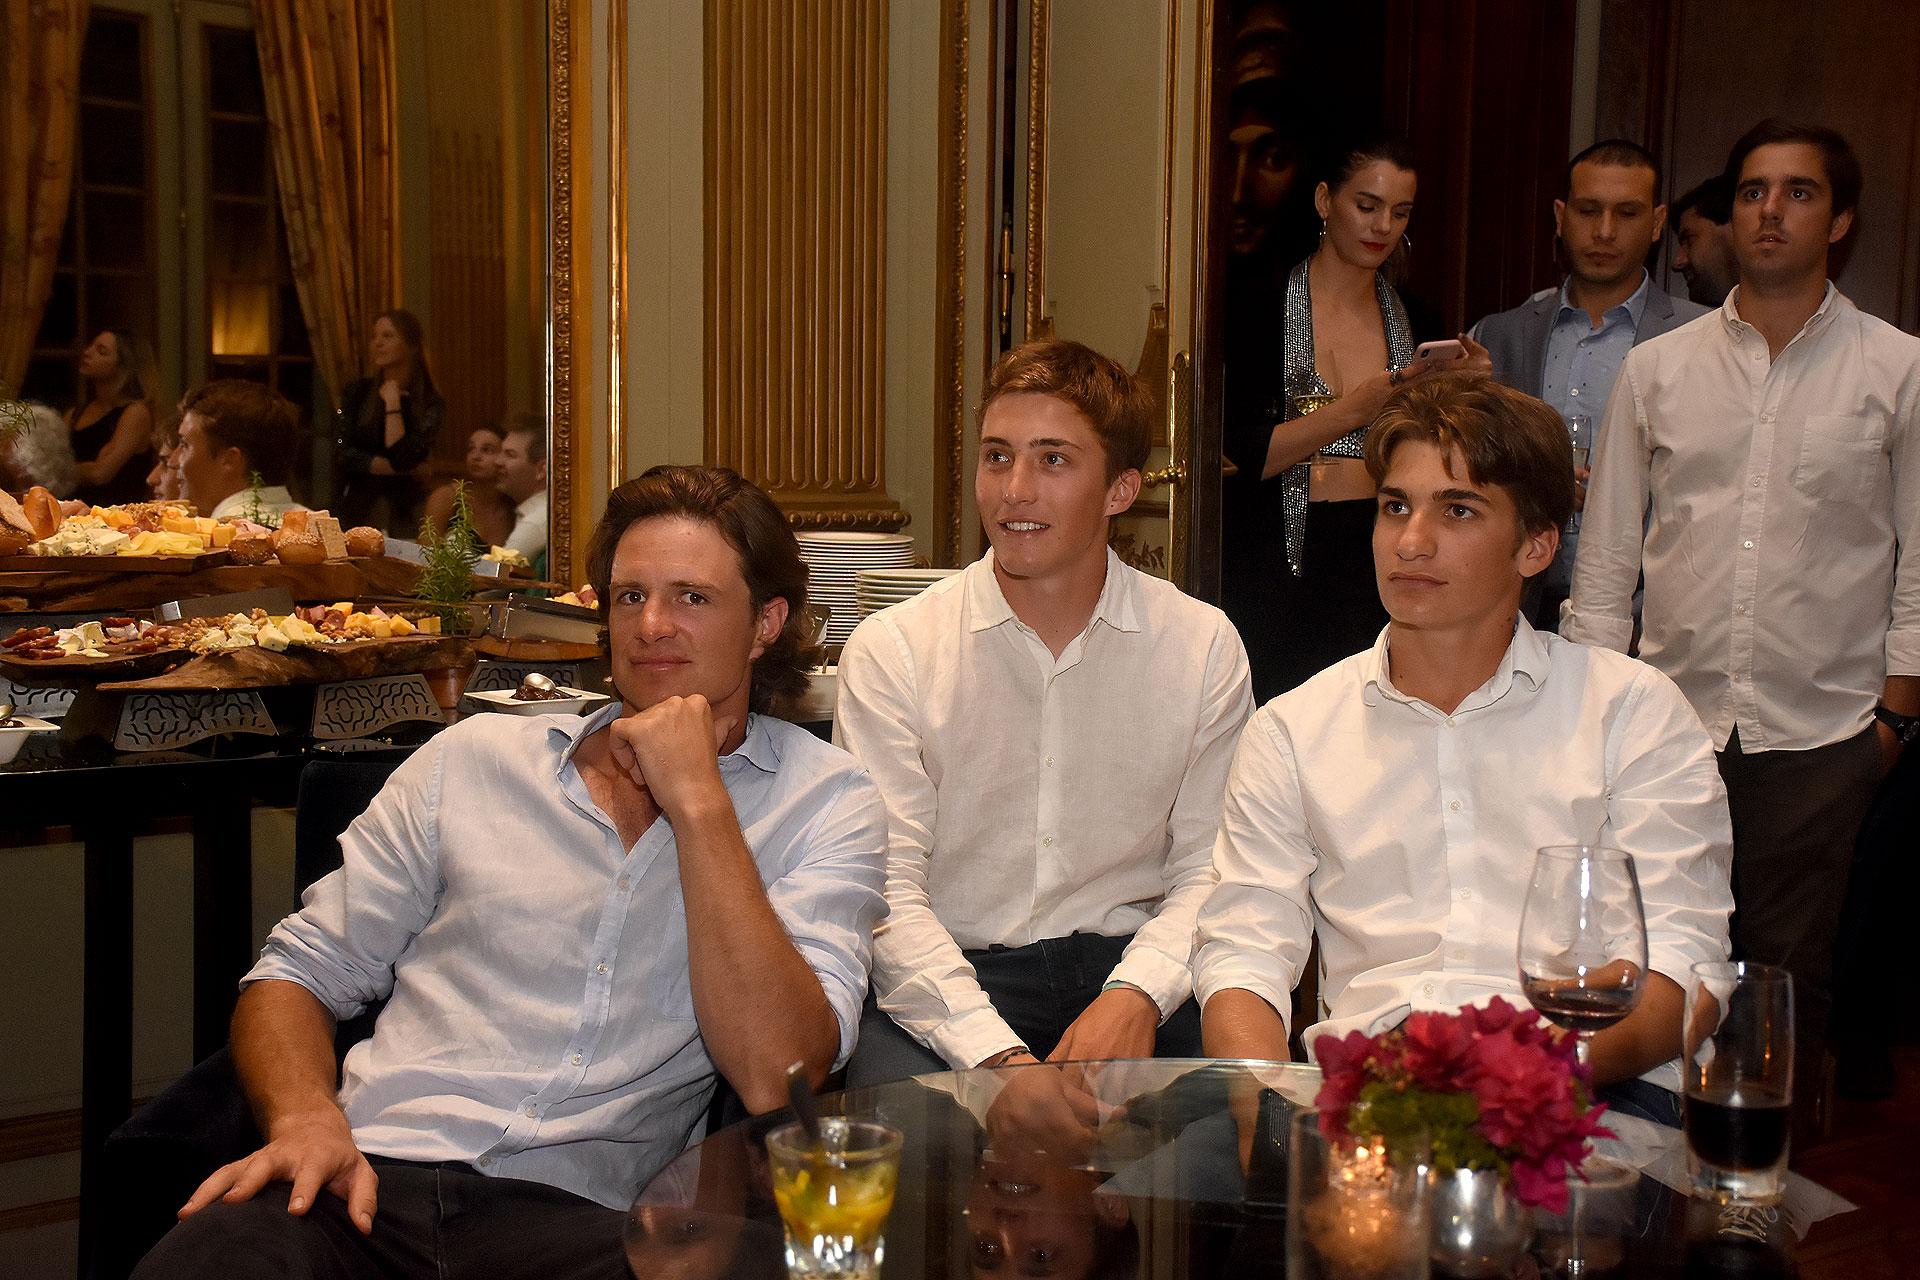 Ignatius Du Plessis junto a Bartolomé (h) y Camilo Castagnola